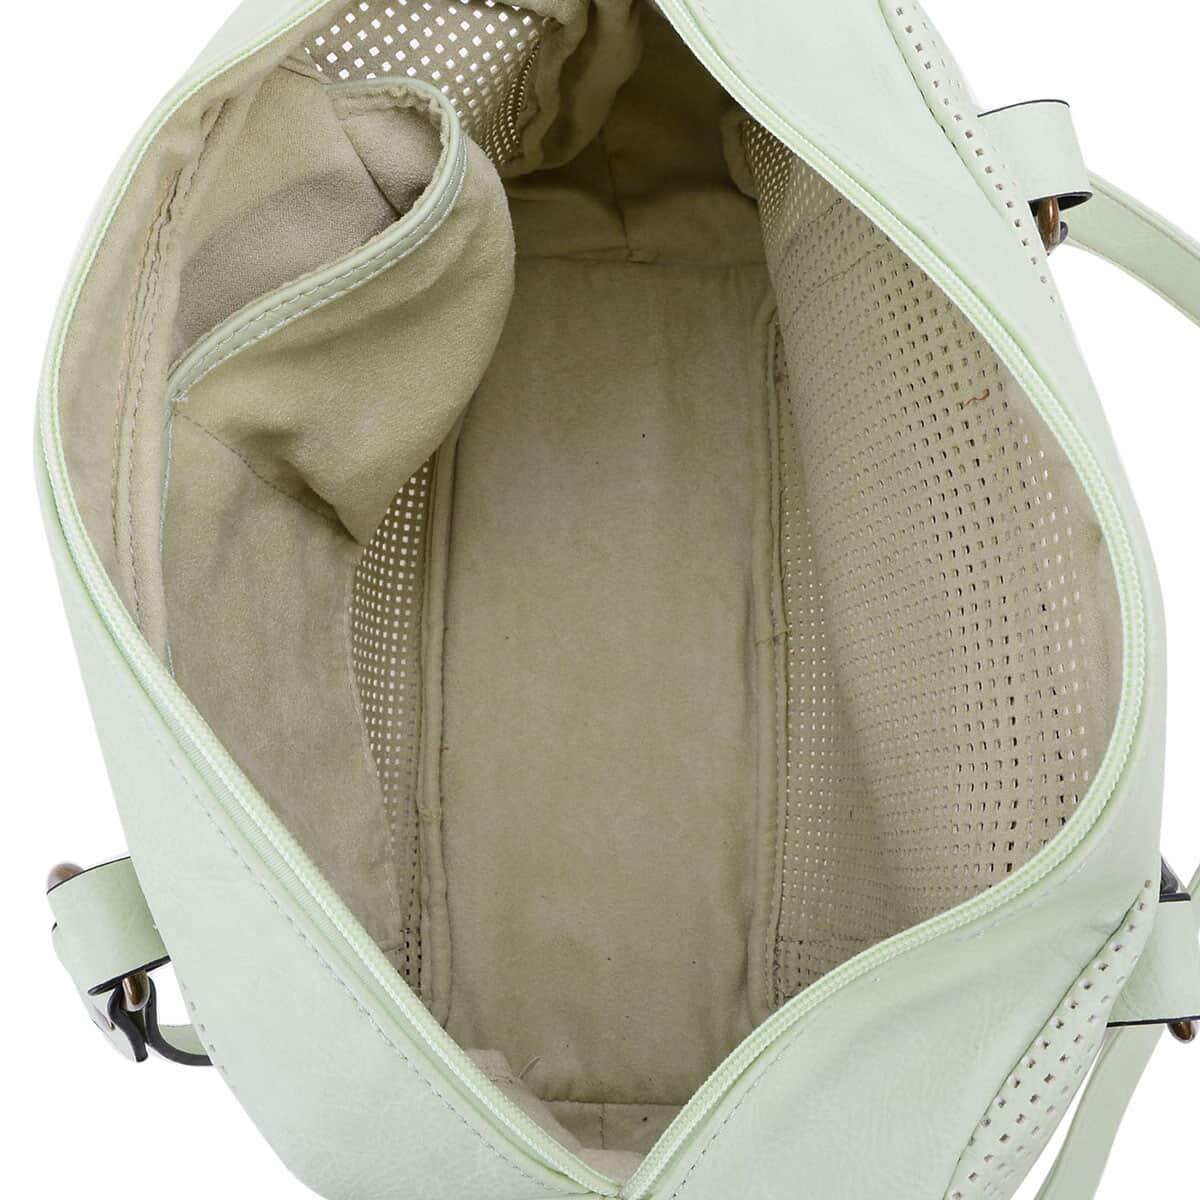 J Francis - Mint Green Faux Leather Handbag (10x5x14 in)